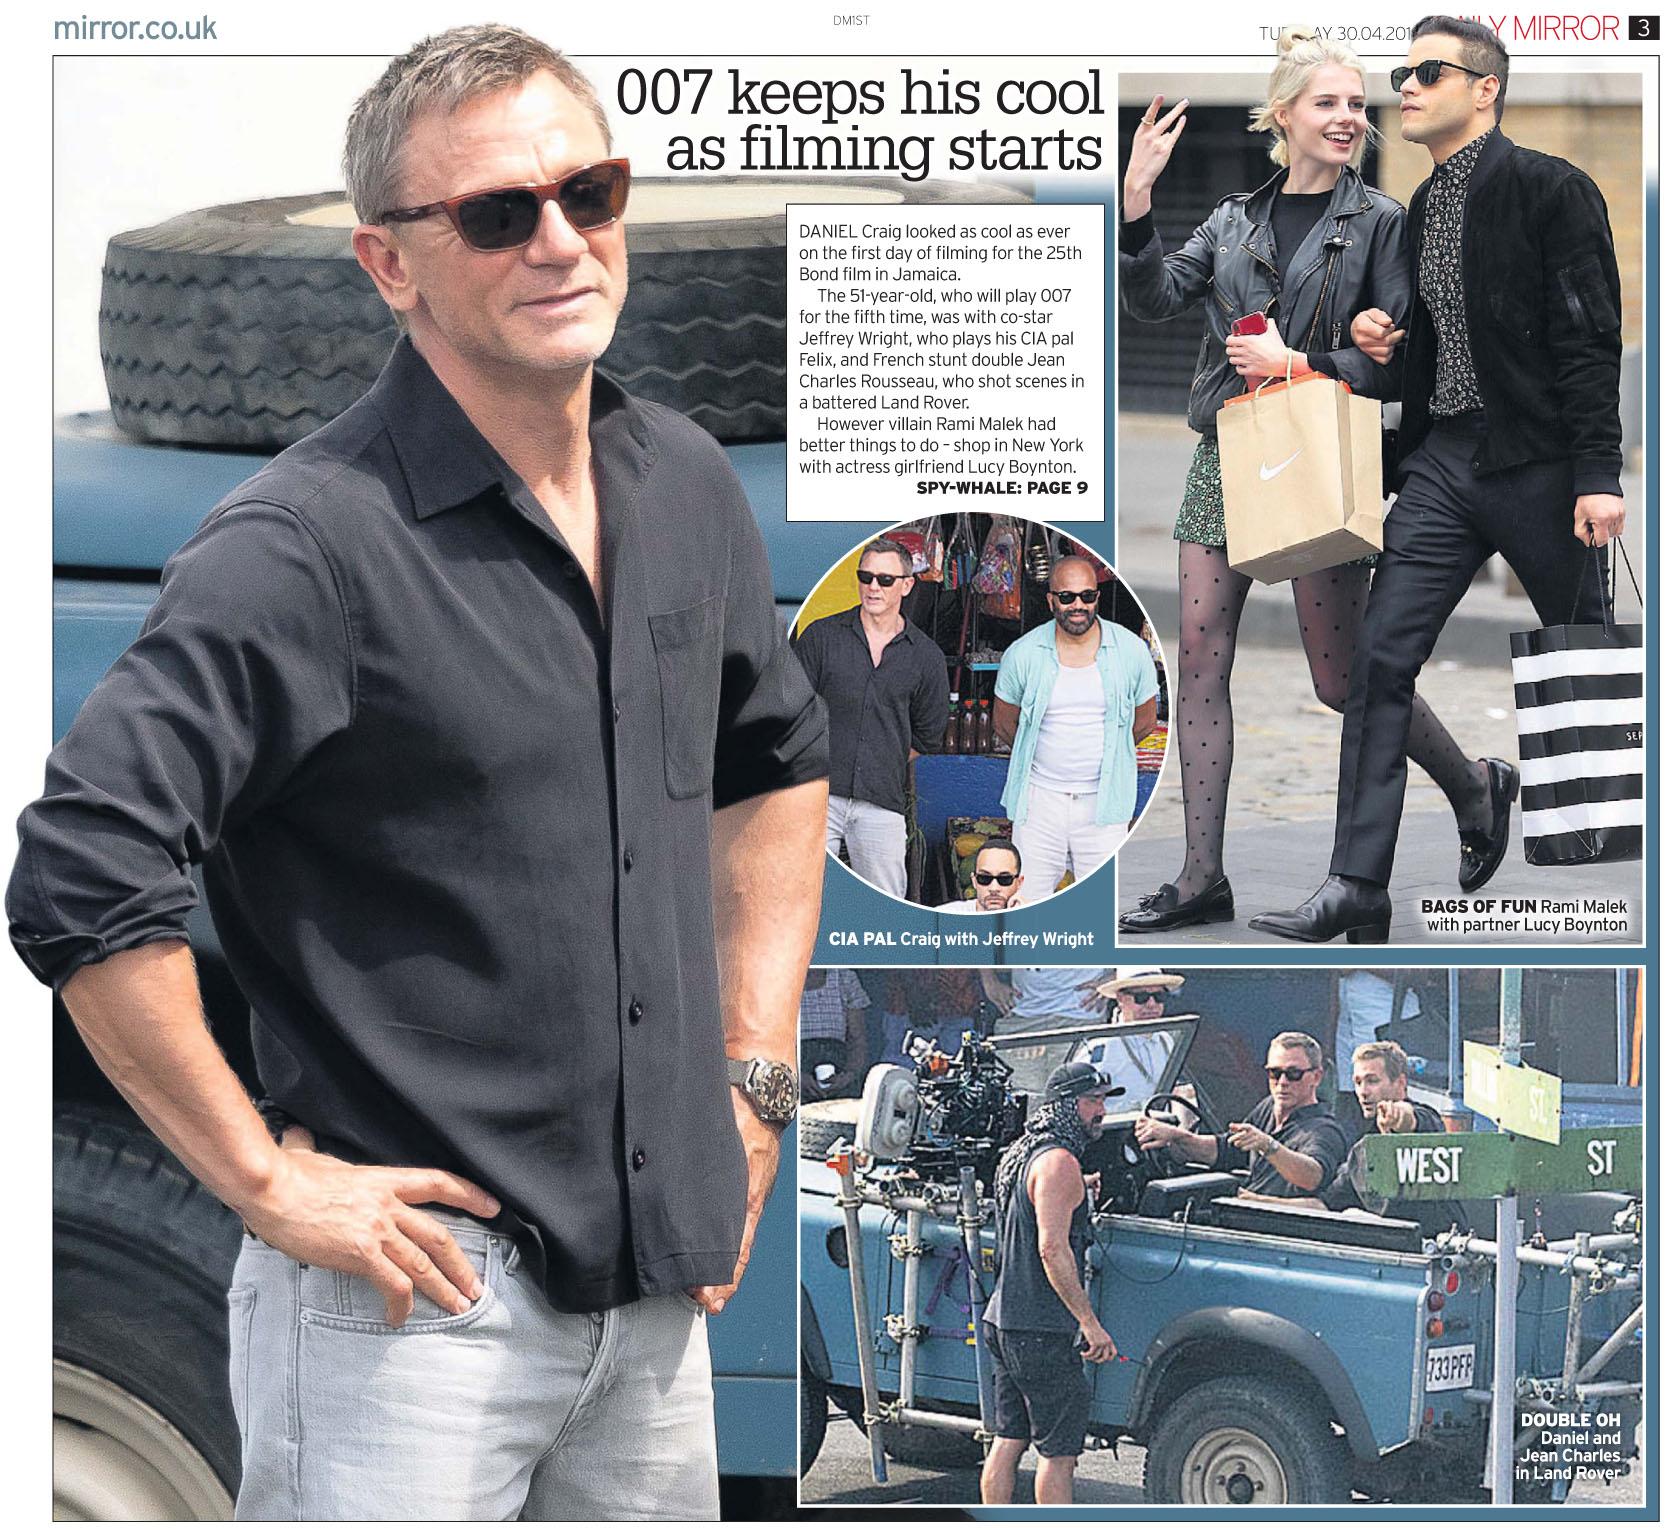 Daily Mirror April 30 2019 Bond.jpg